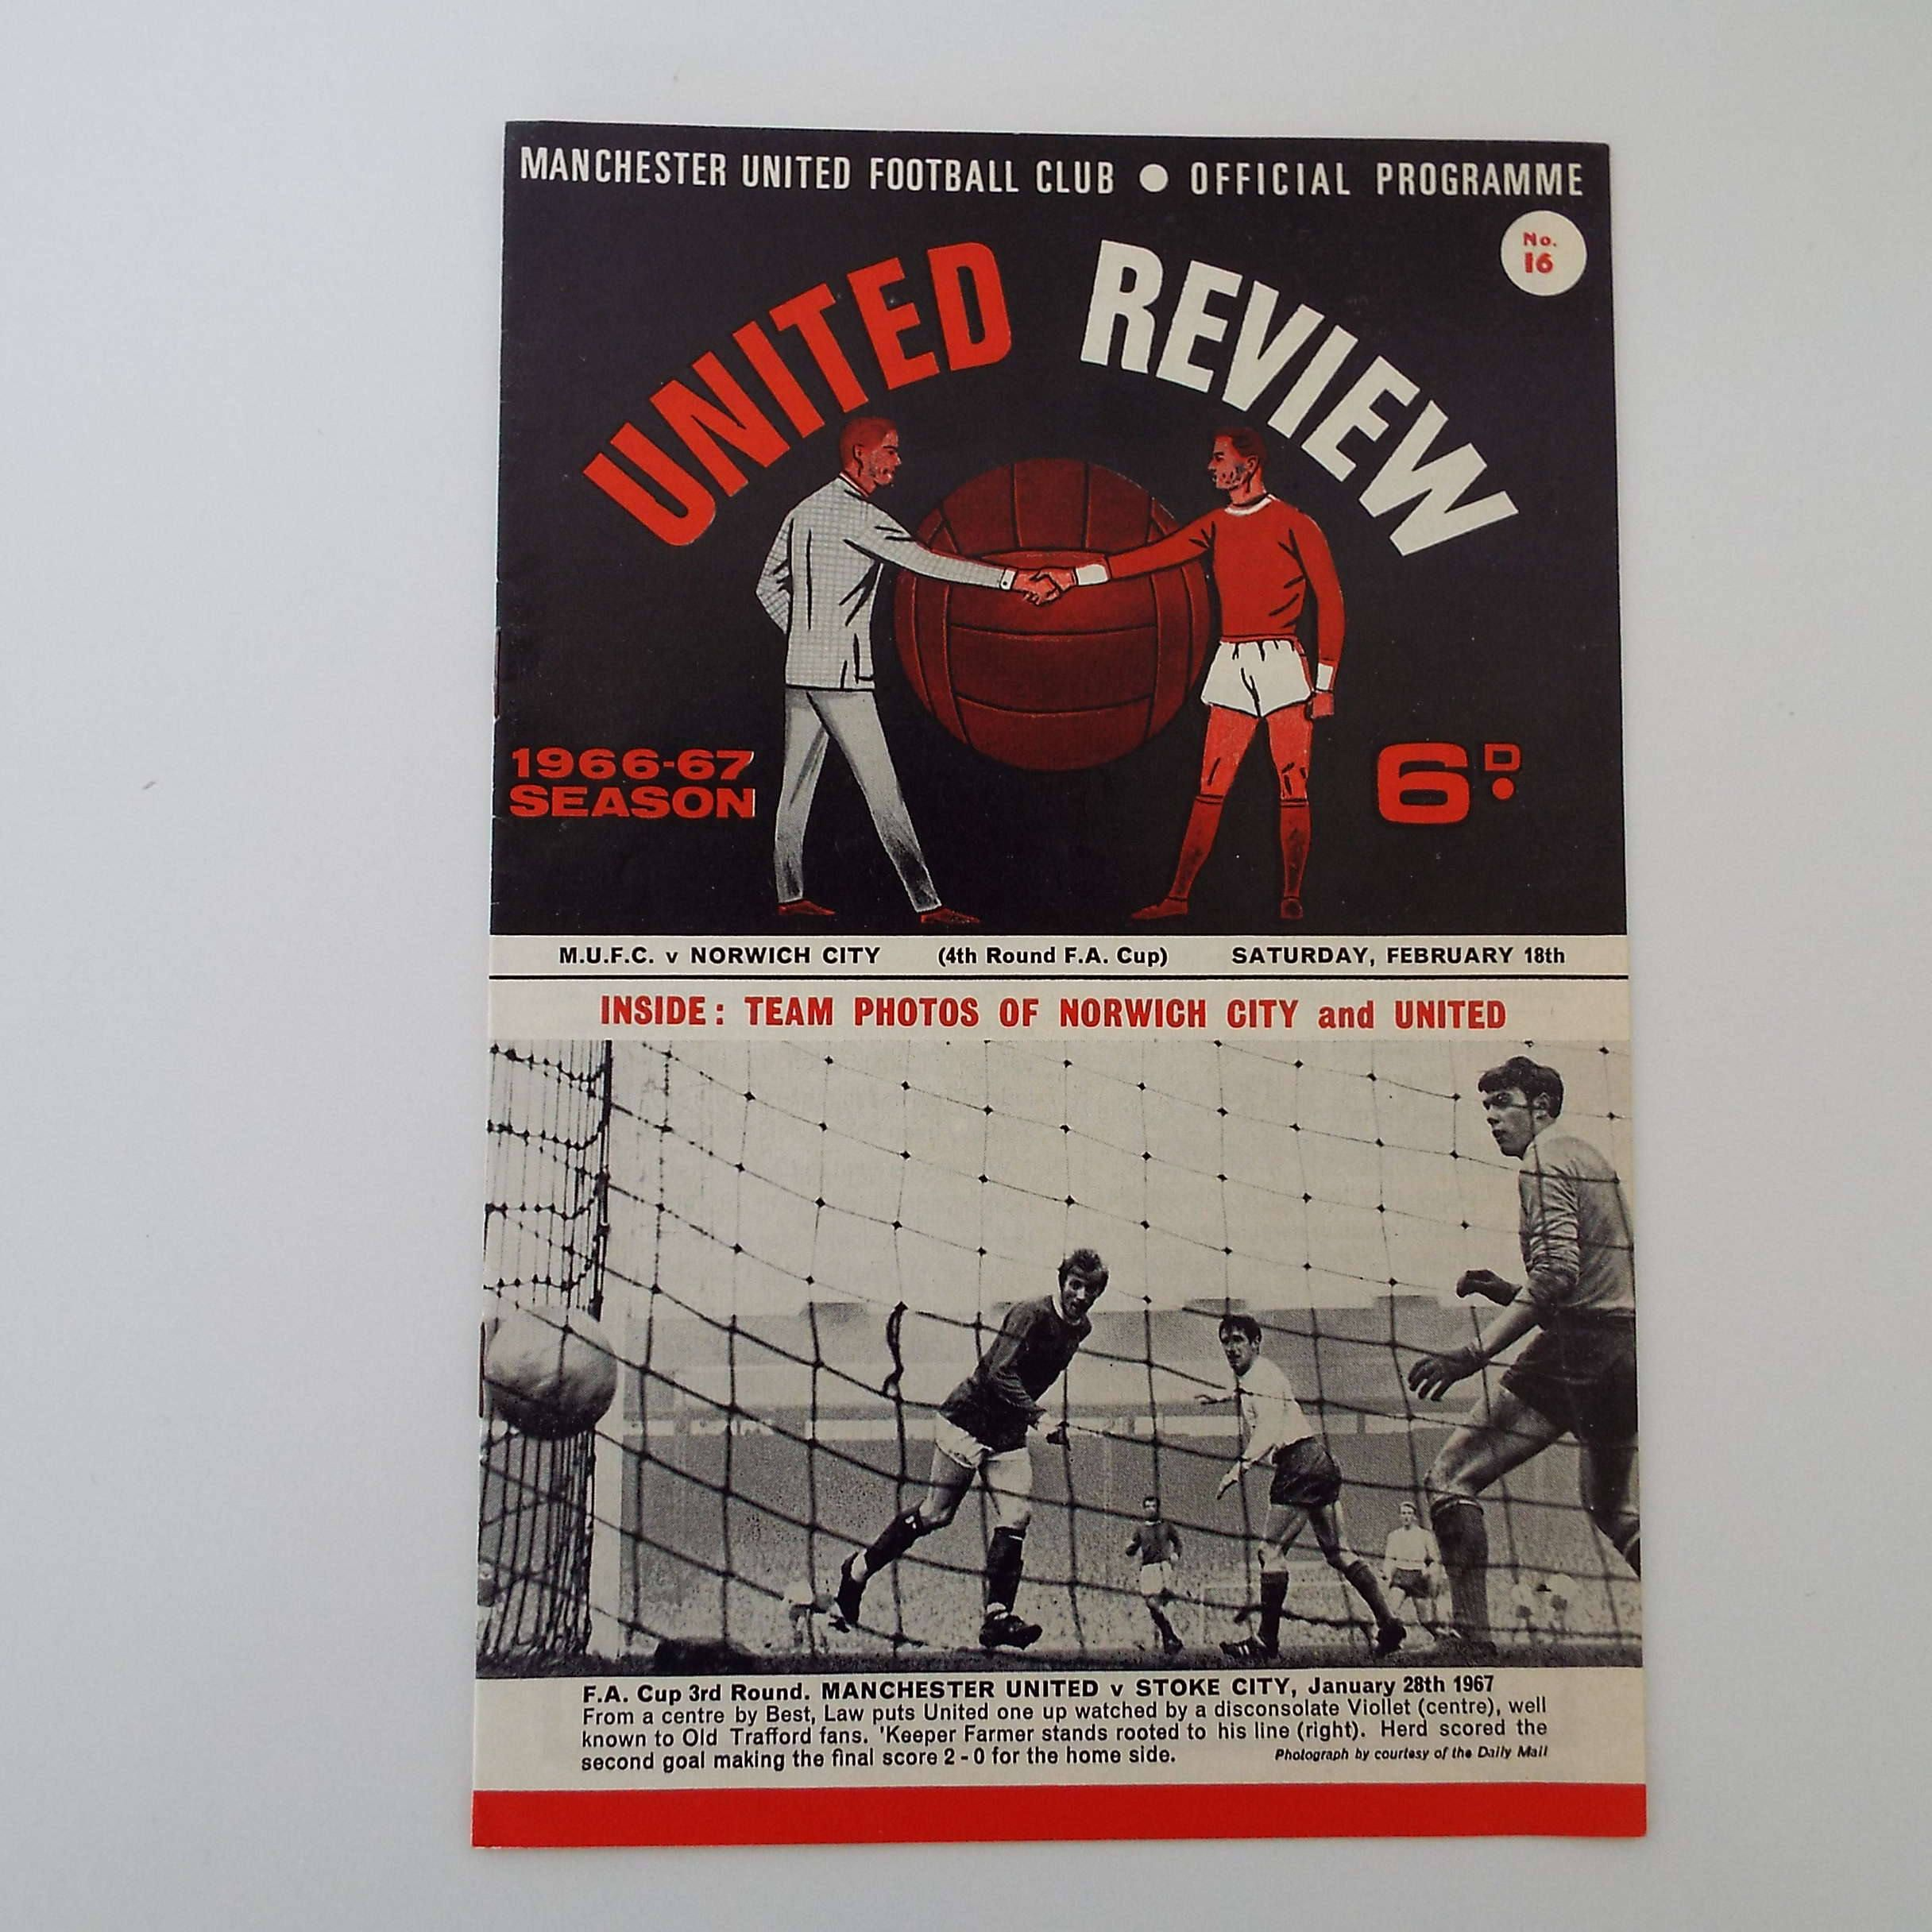 Vintage 1967 Manchester United Versus Norwich City Football Etsy Norwich City Football Manchester United Manchester United Football